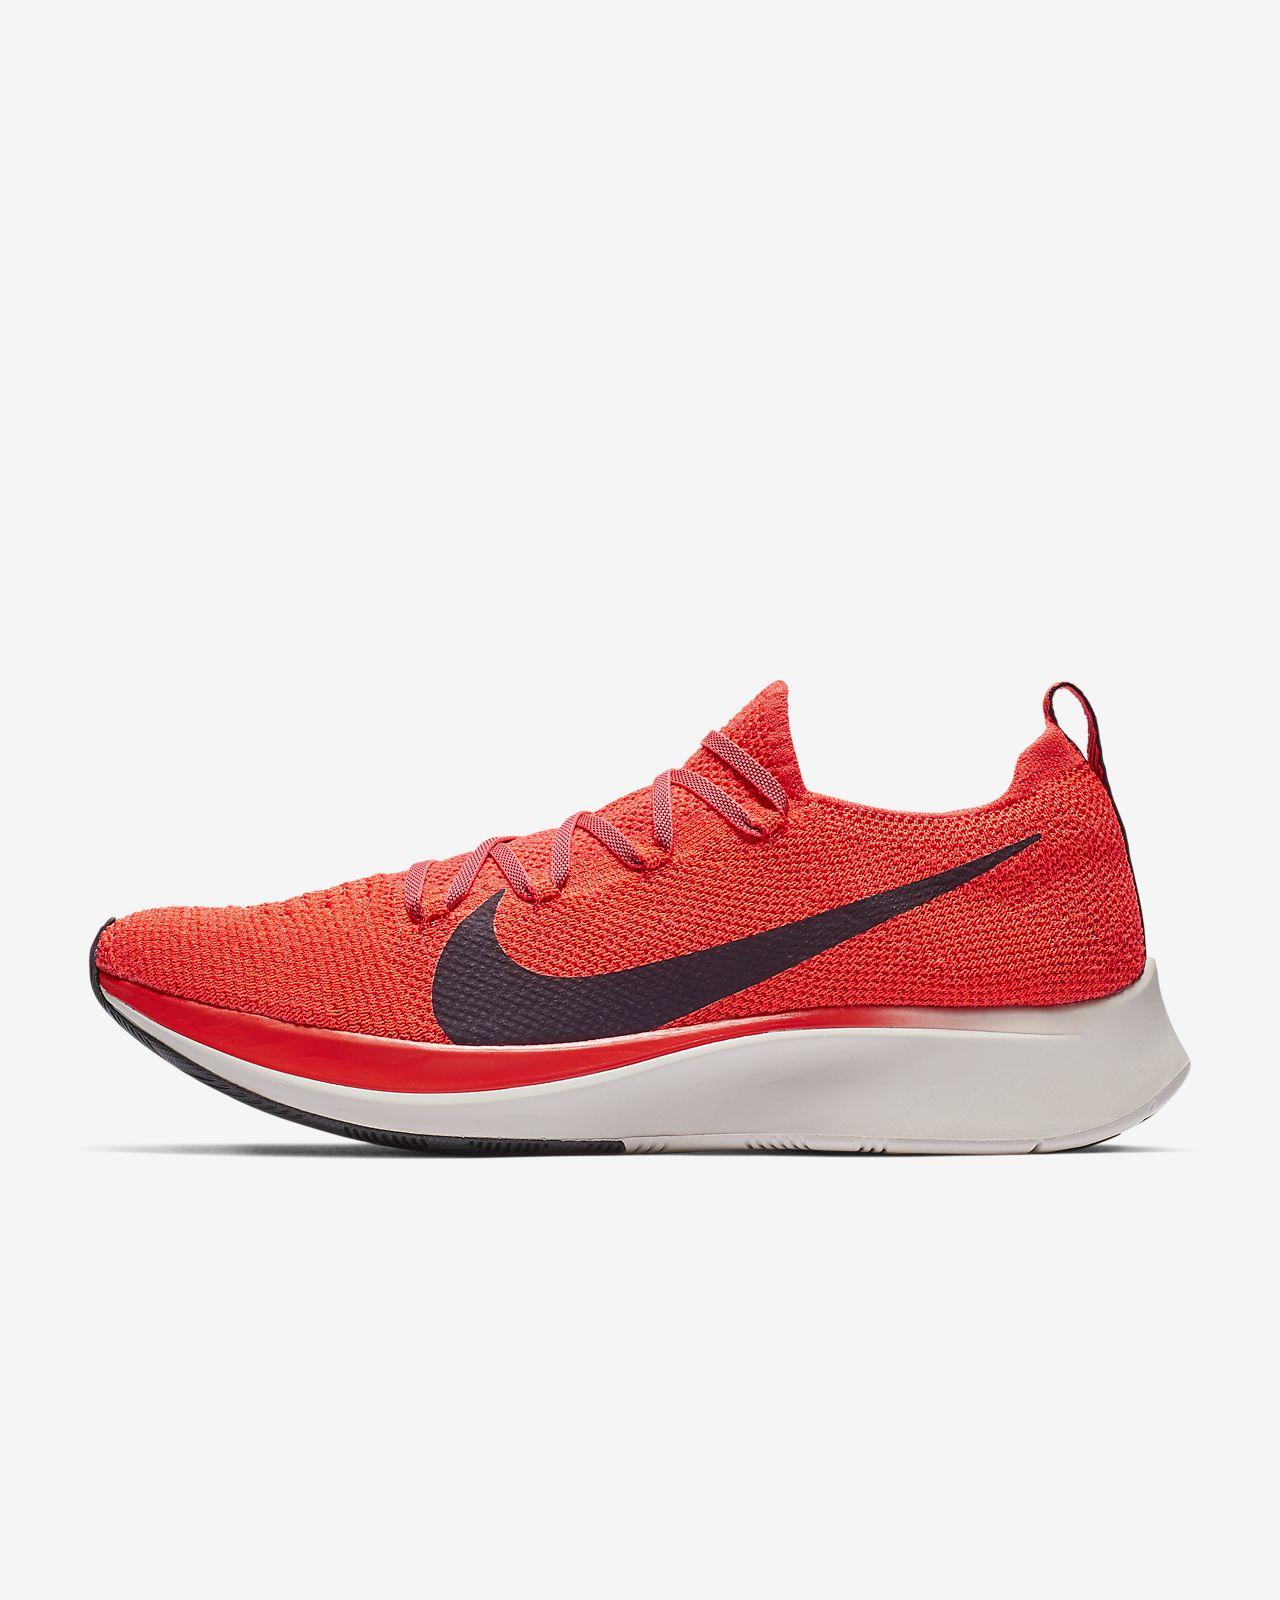 check out e1698 e7346 Scarpa da running Nike Zoom Fly Flyknit - Uomo. Nike.com IT